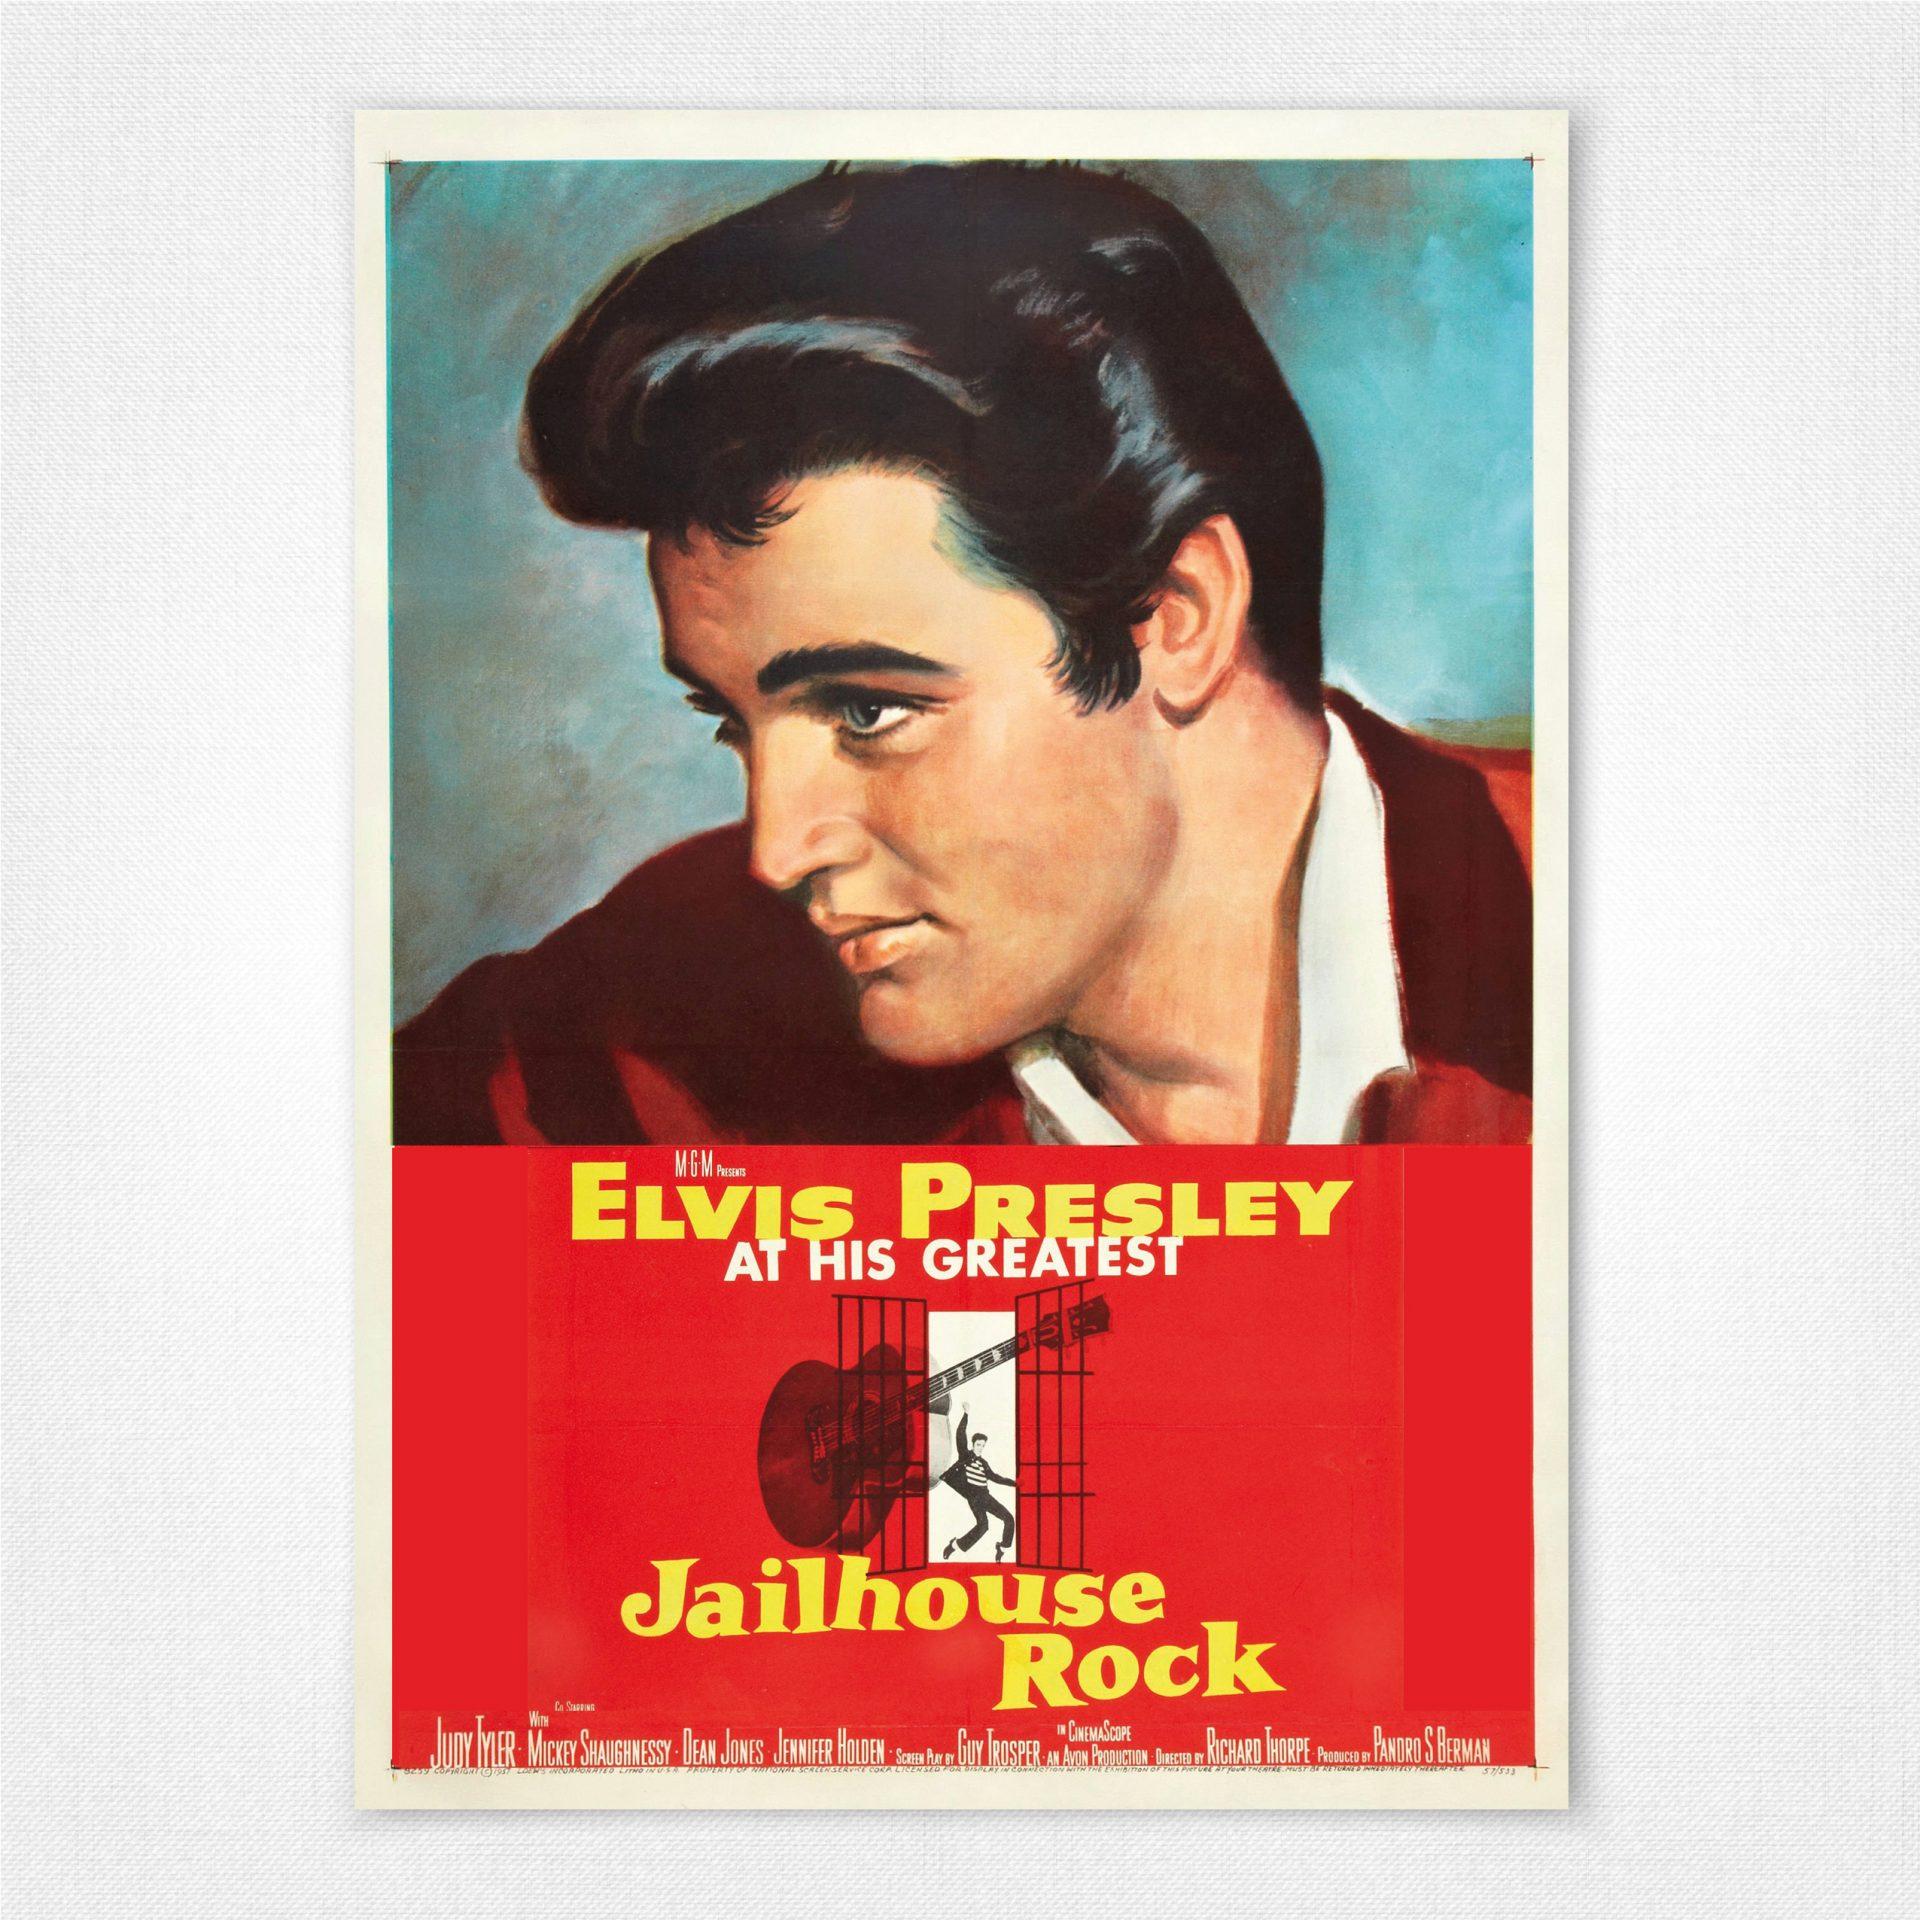 Vintage Movie Poster Reproduction Jailhouse Rock Elvis Presley M.G.M